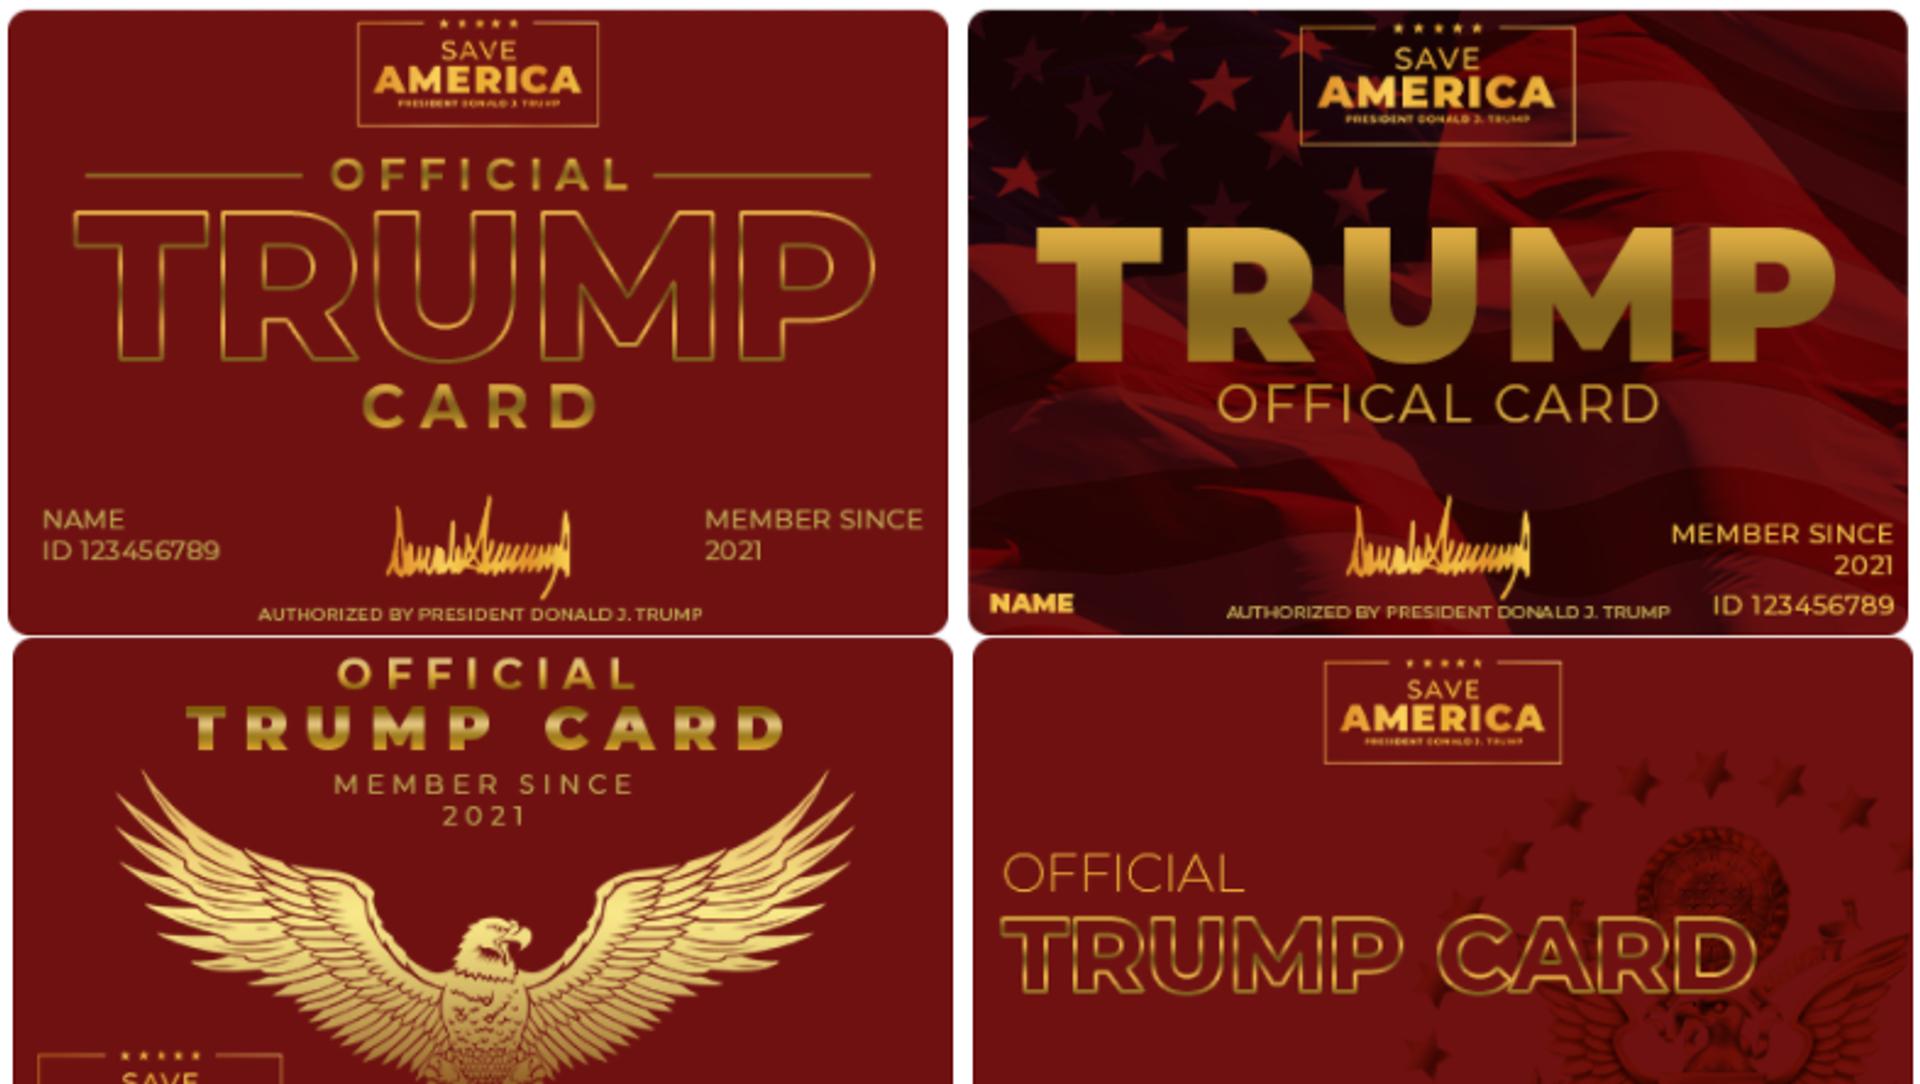 'Official Trump Card' designs. - Sputnik International, 1920, 05.08.2021